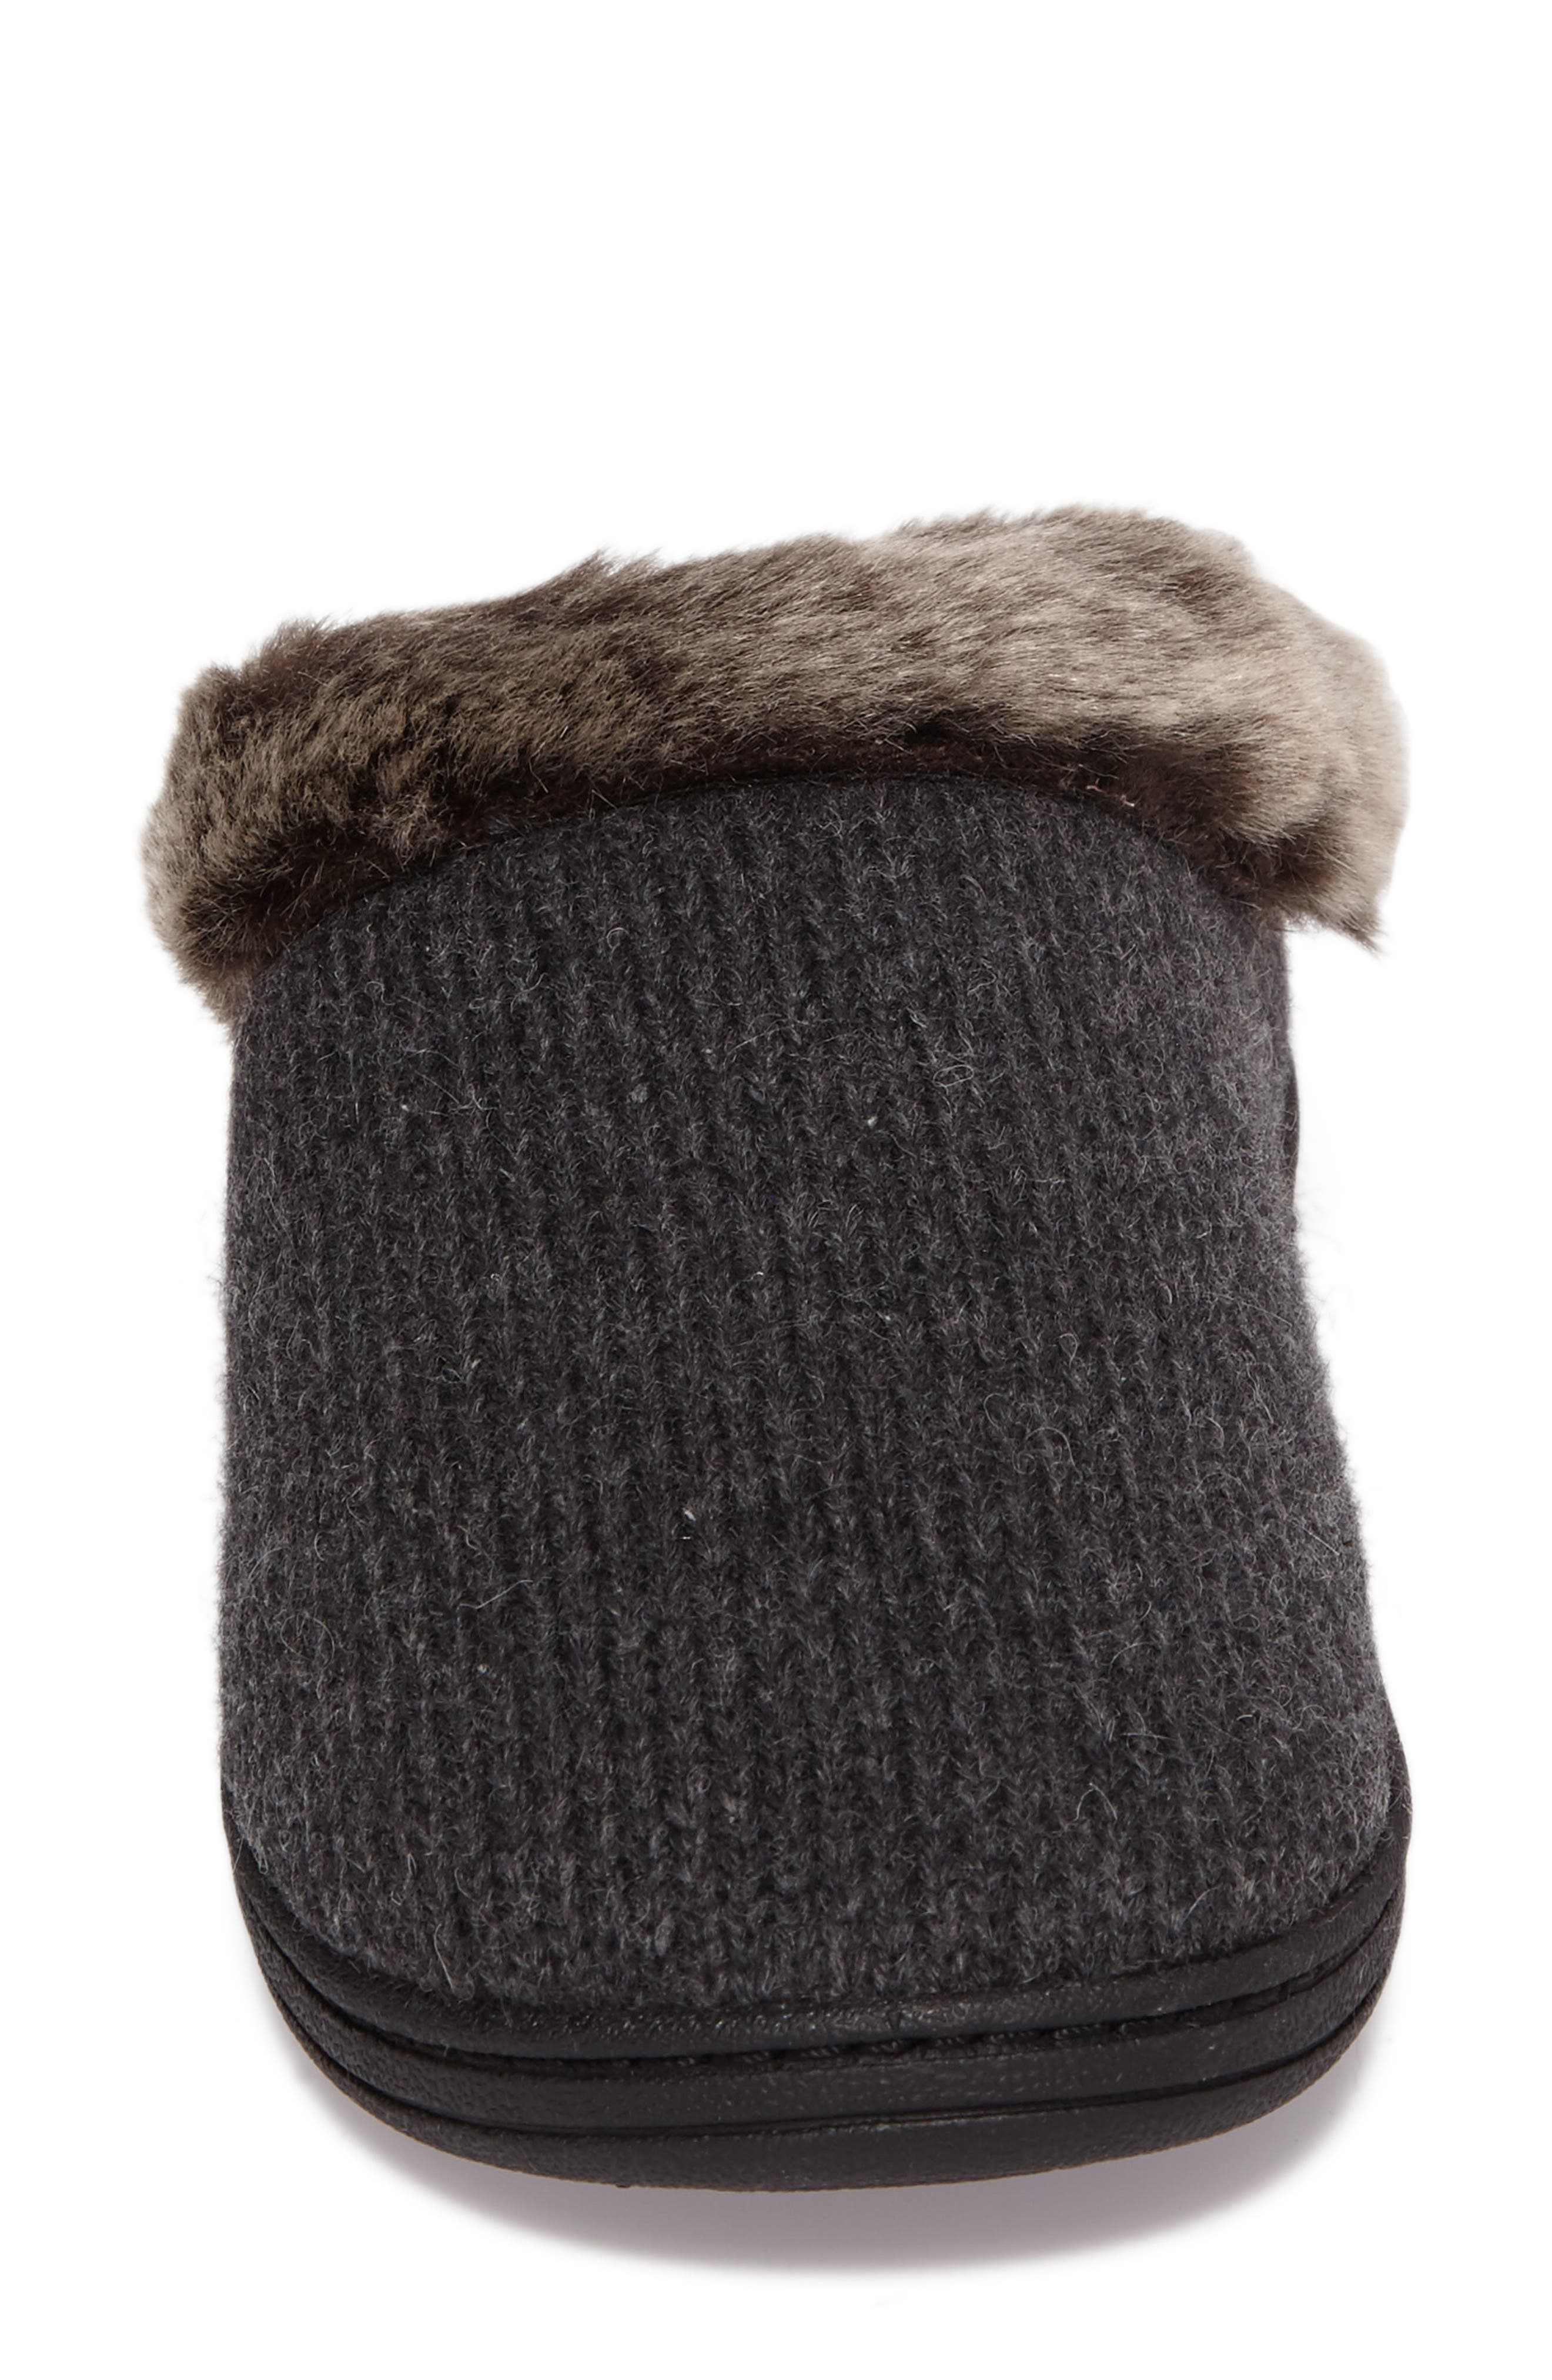 Chinchilla Faux Fur Slipper,                             Alternate thumbnail 4, color,                             Dark Charcoal Heather